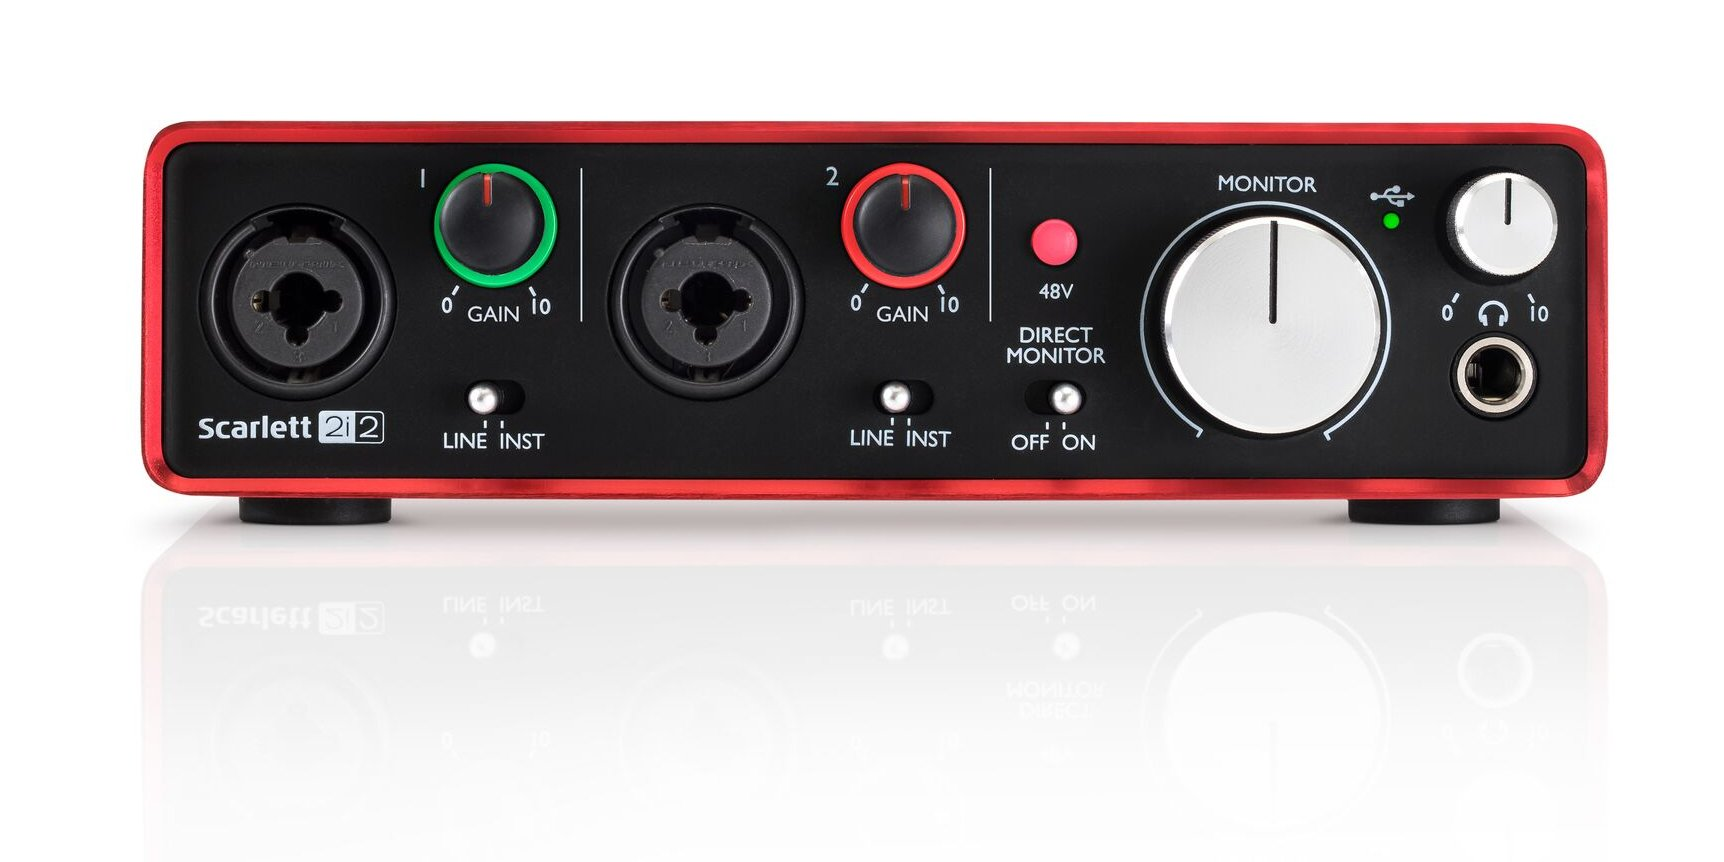 focusrite scarlett 2i2 v2 2x2 usb audio interface 2nd generation full compass systems. Black Bedroom Furniture Sets. Home Design Ideas